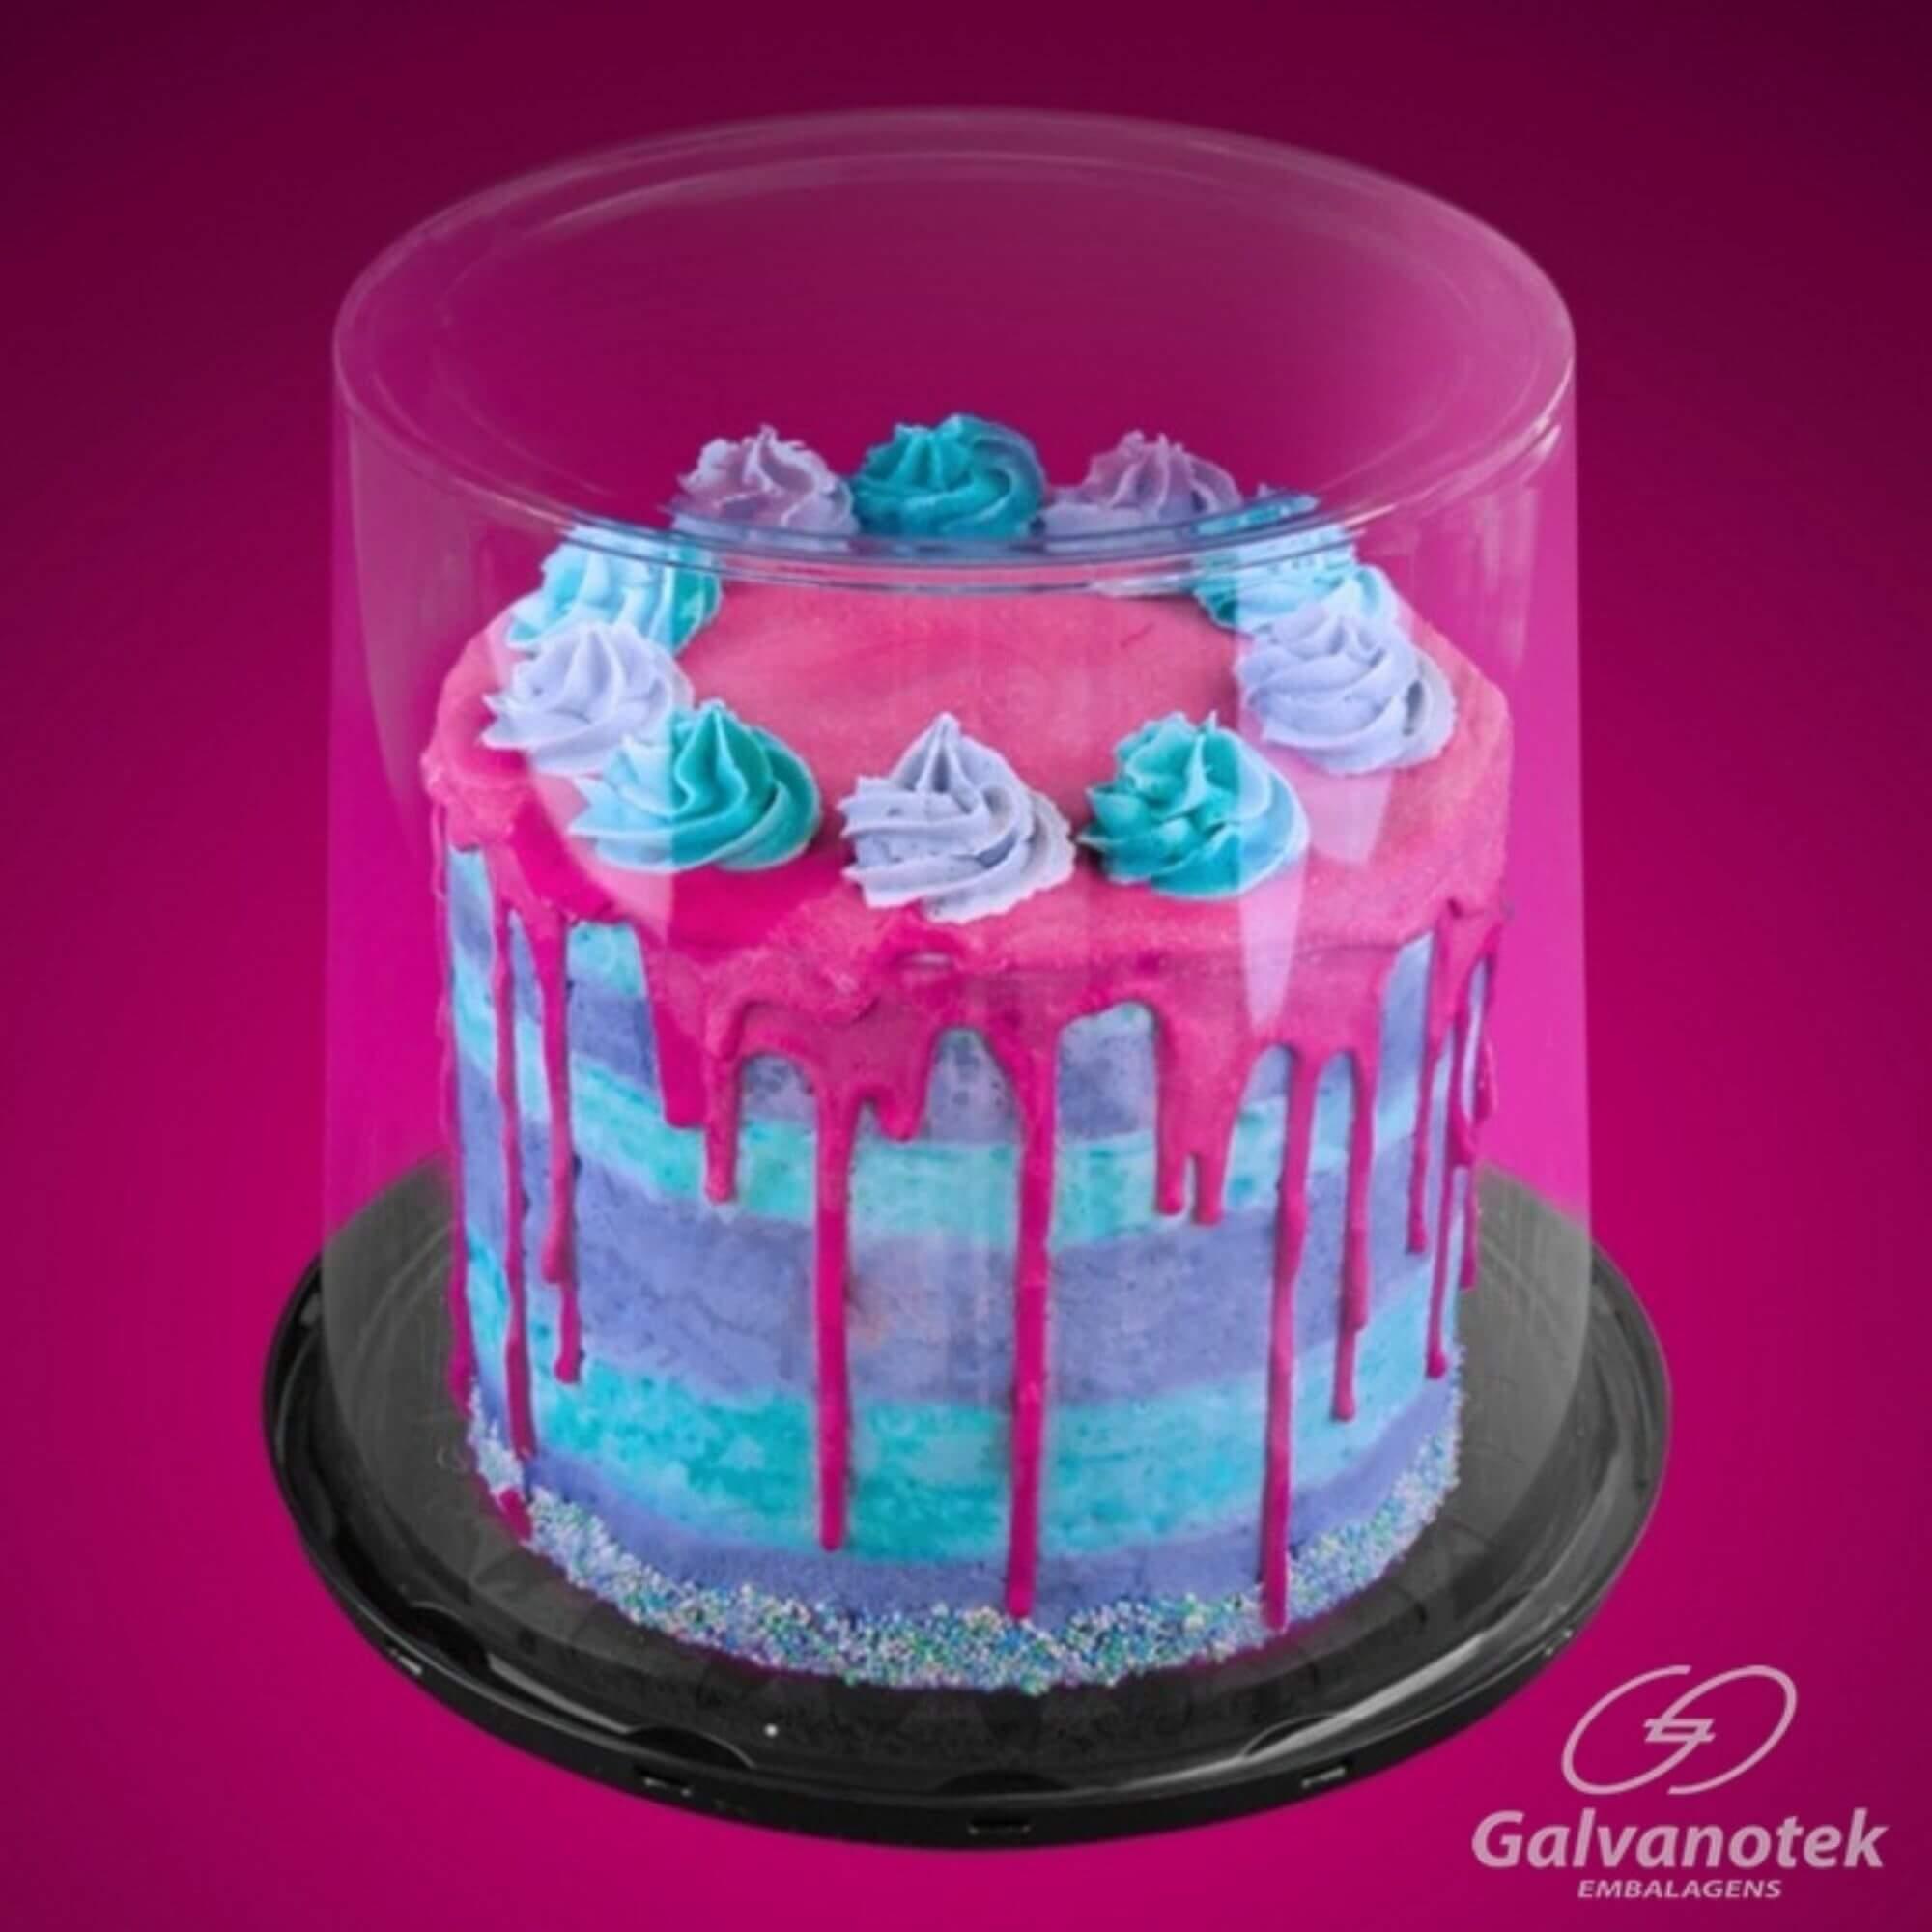 Embalagem naked cake e bolo gourmet tampa super alta 23cm G58CT Galvanotek